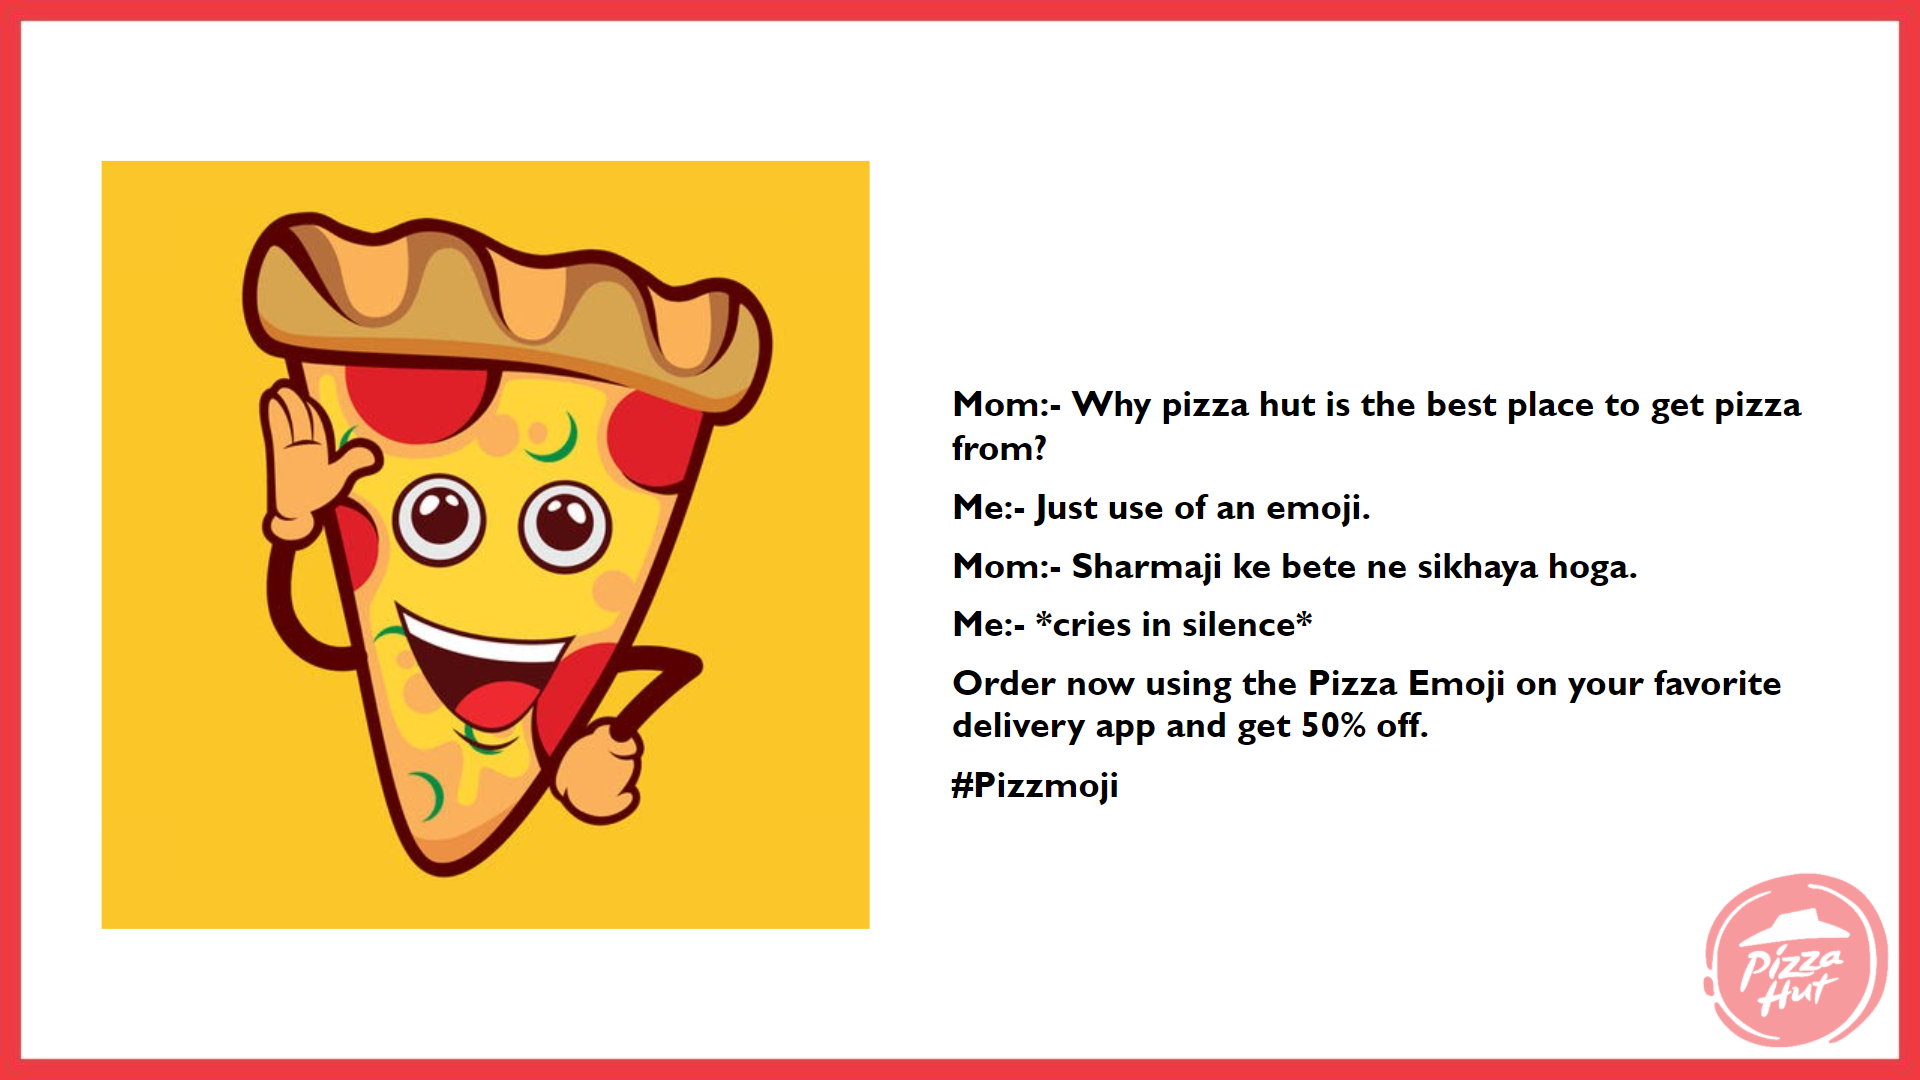 pizza hut marketing strategy Organic Post 2 - Pizza Hut Marketing and Advertising Strategy